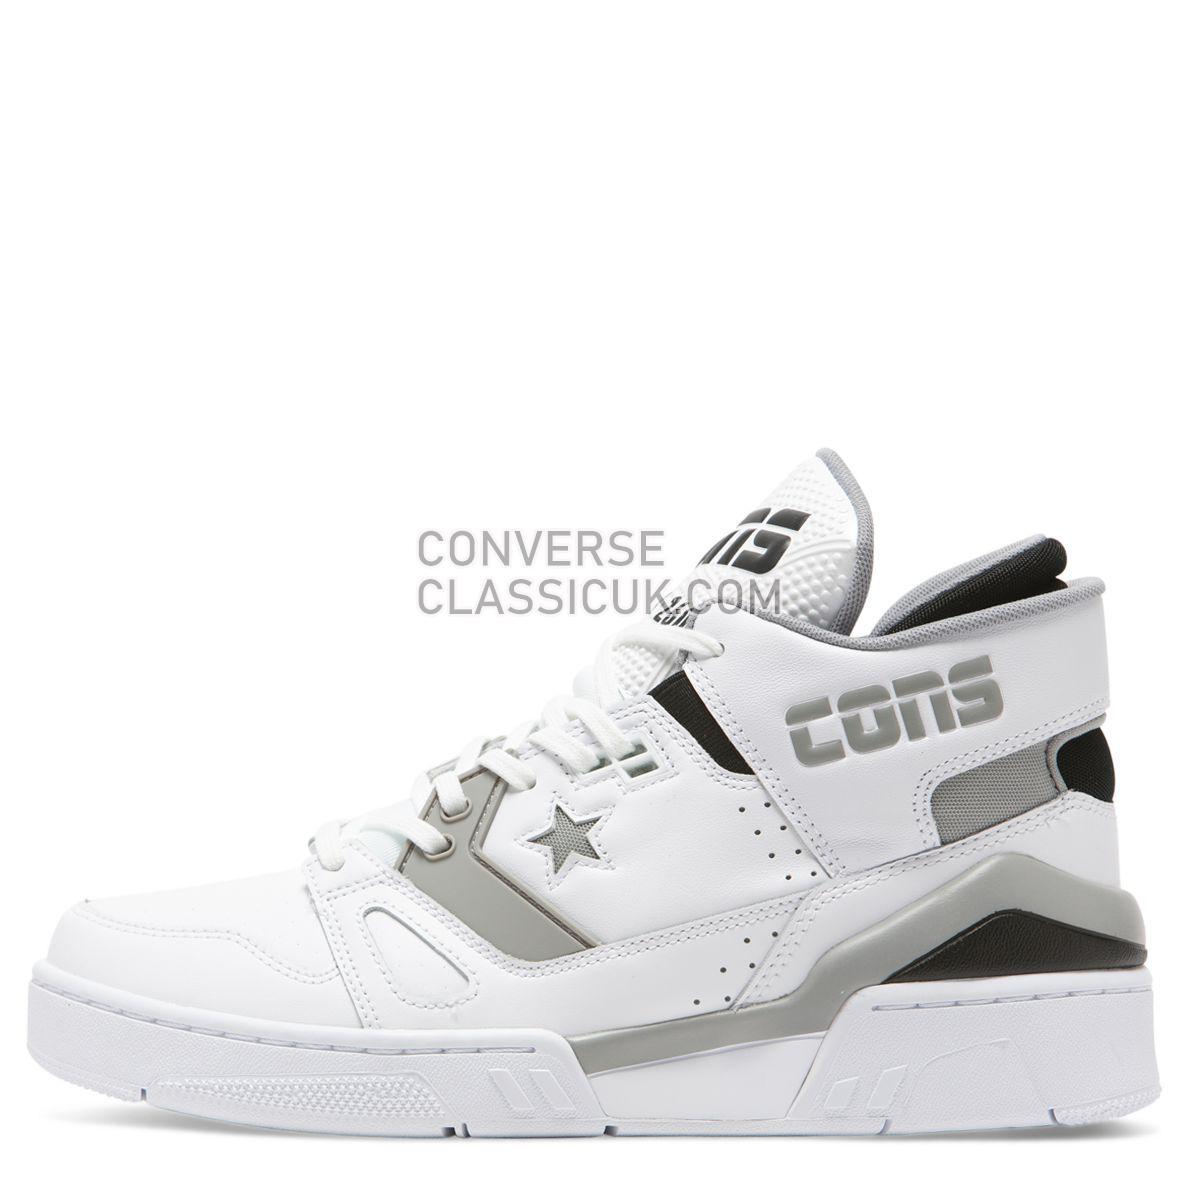 Converse ERX 260 Archive Alive Mid White Mens 165329 White/Mouse/Black Shoes